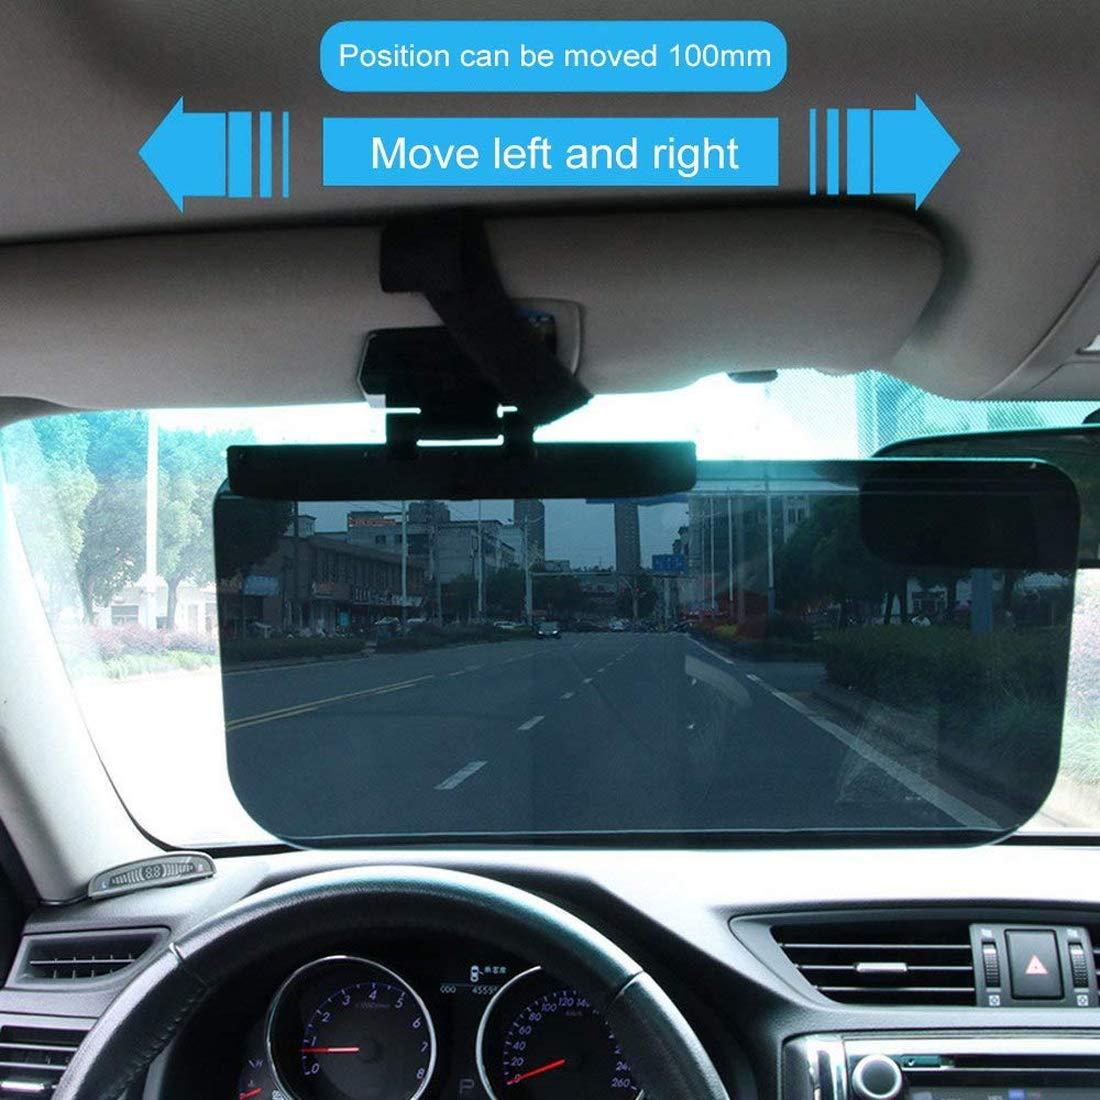 Car Sun Visor by ALZERO Vision Anti-Glare Driving Car Visor 180 Degrees Rotating Sun Blocker for Eye Protector Universal Automobile Anti-Dazzle Sunshade Windshield Extension